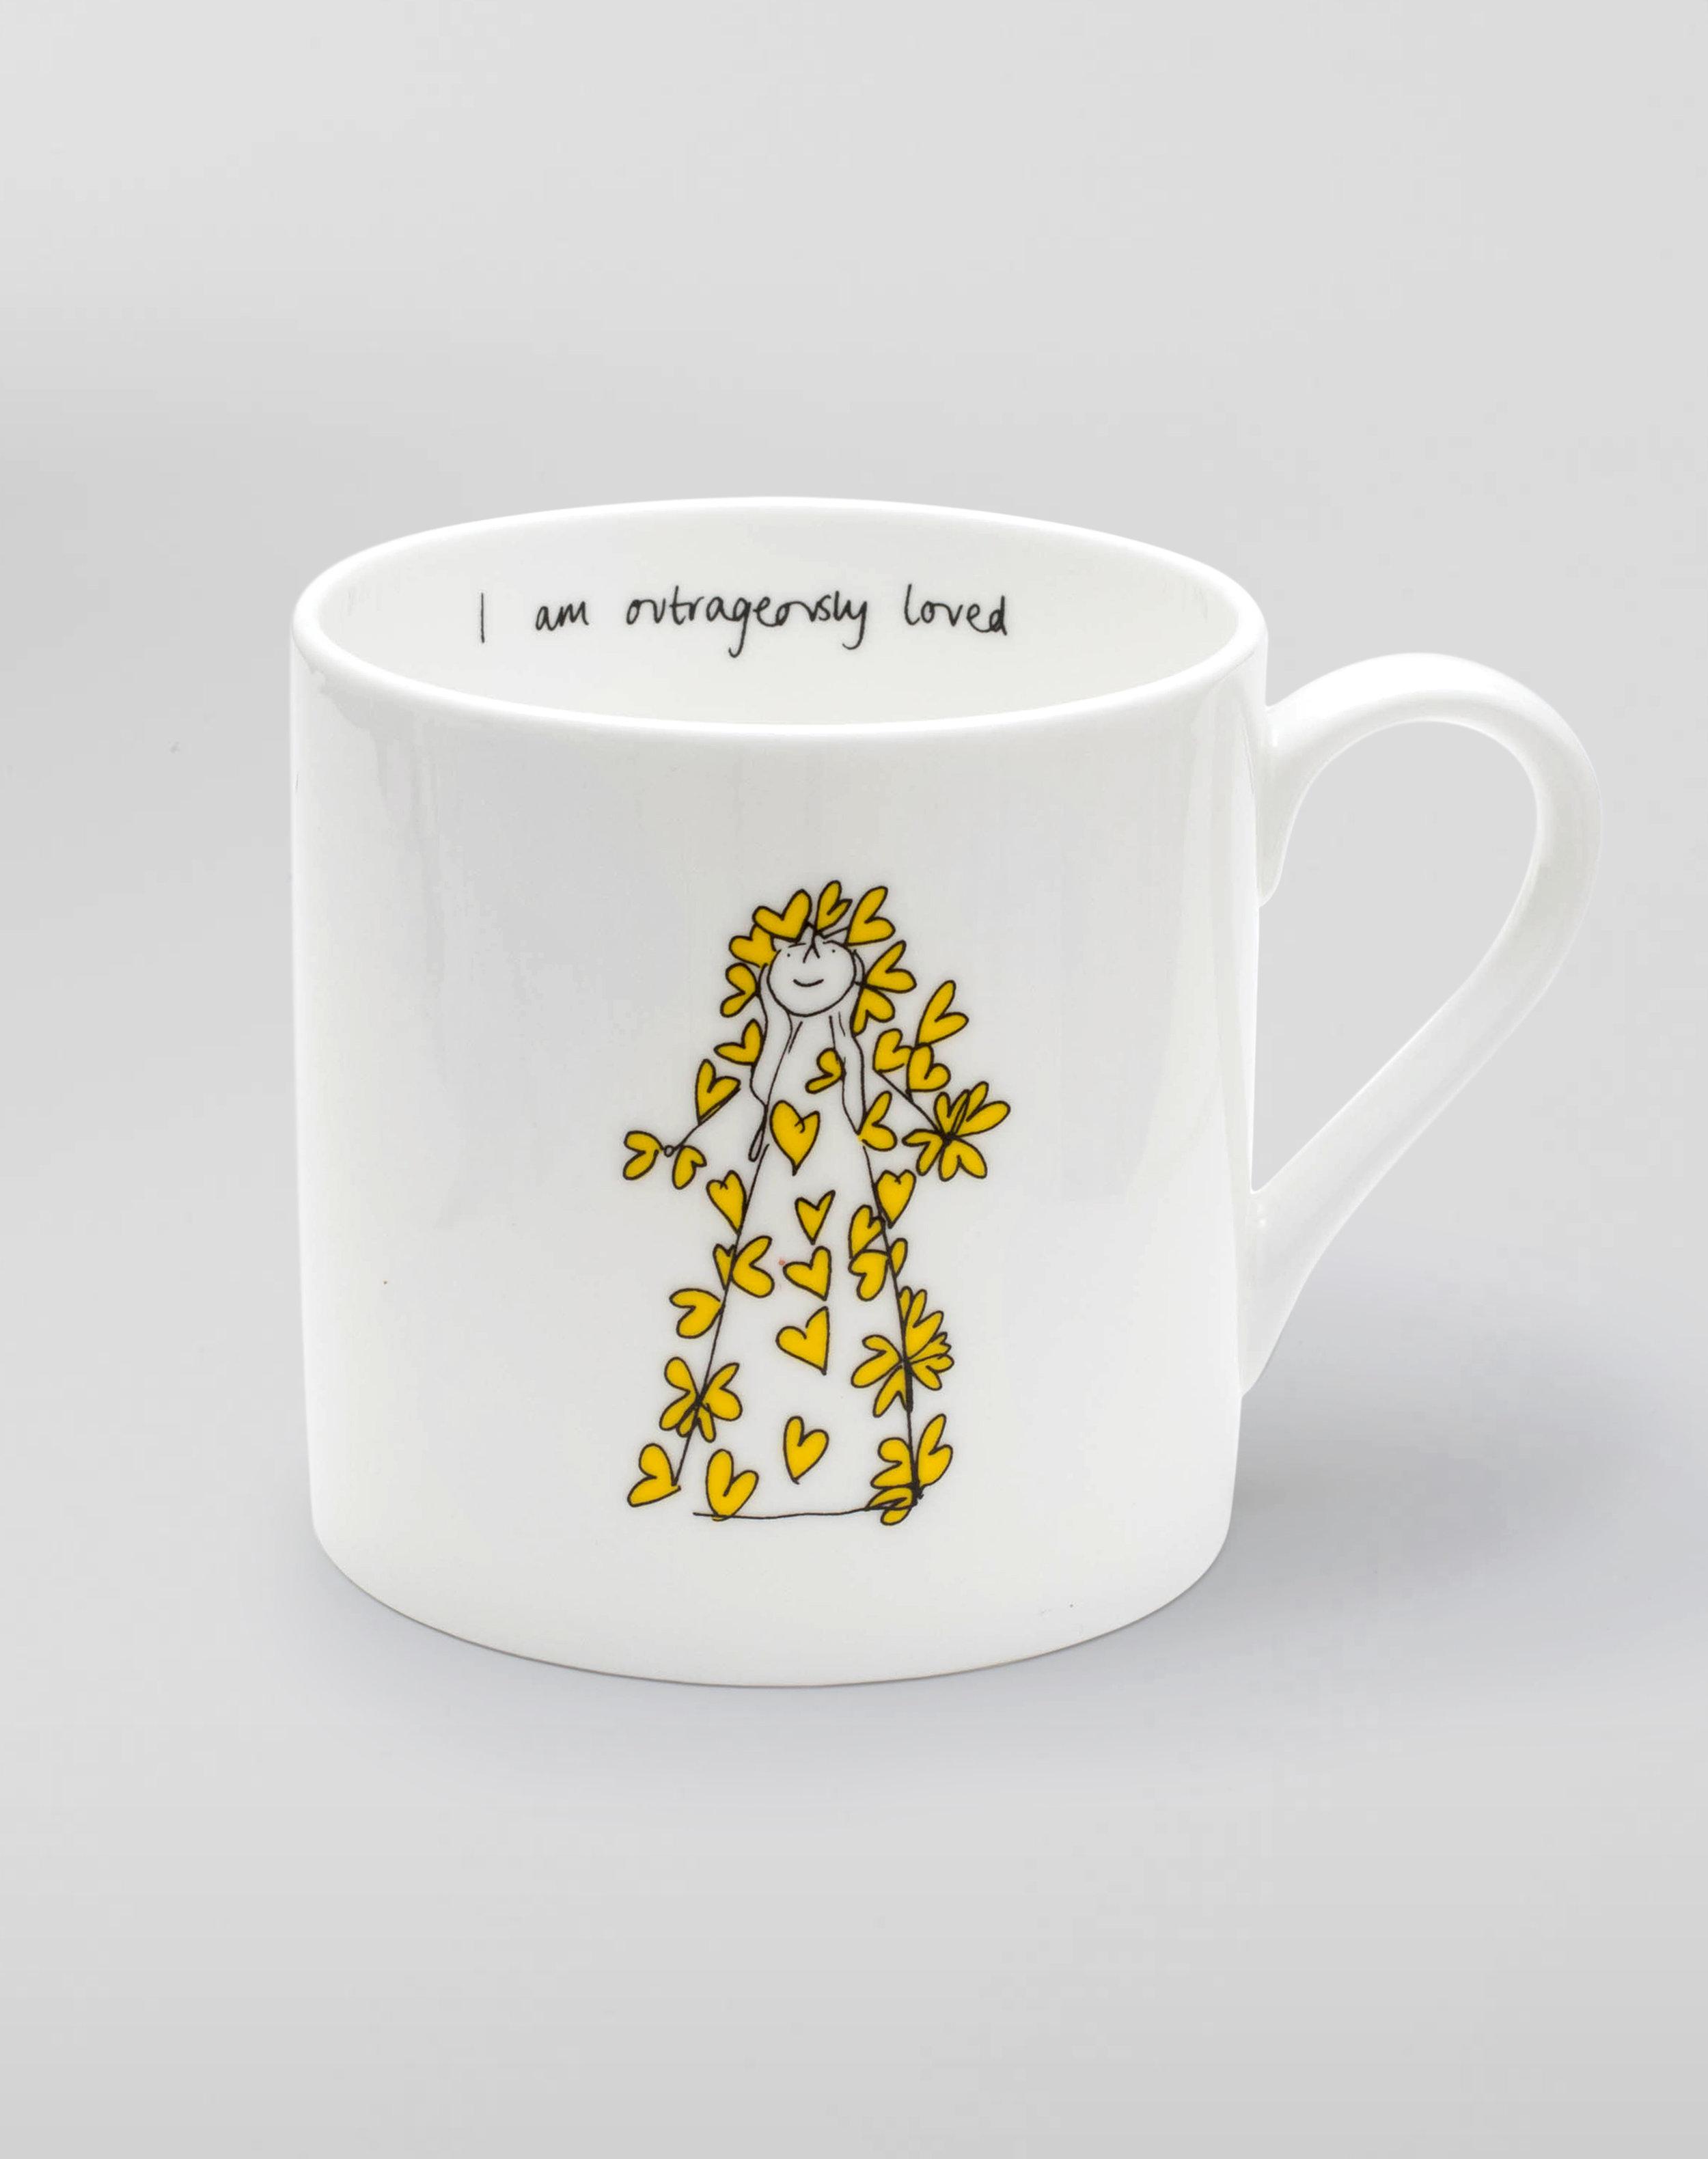 I AM Outrageously loved MUG.jpg